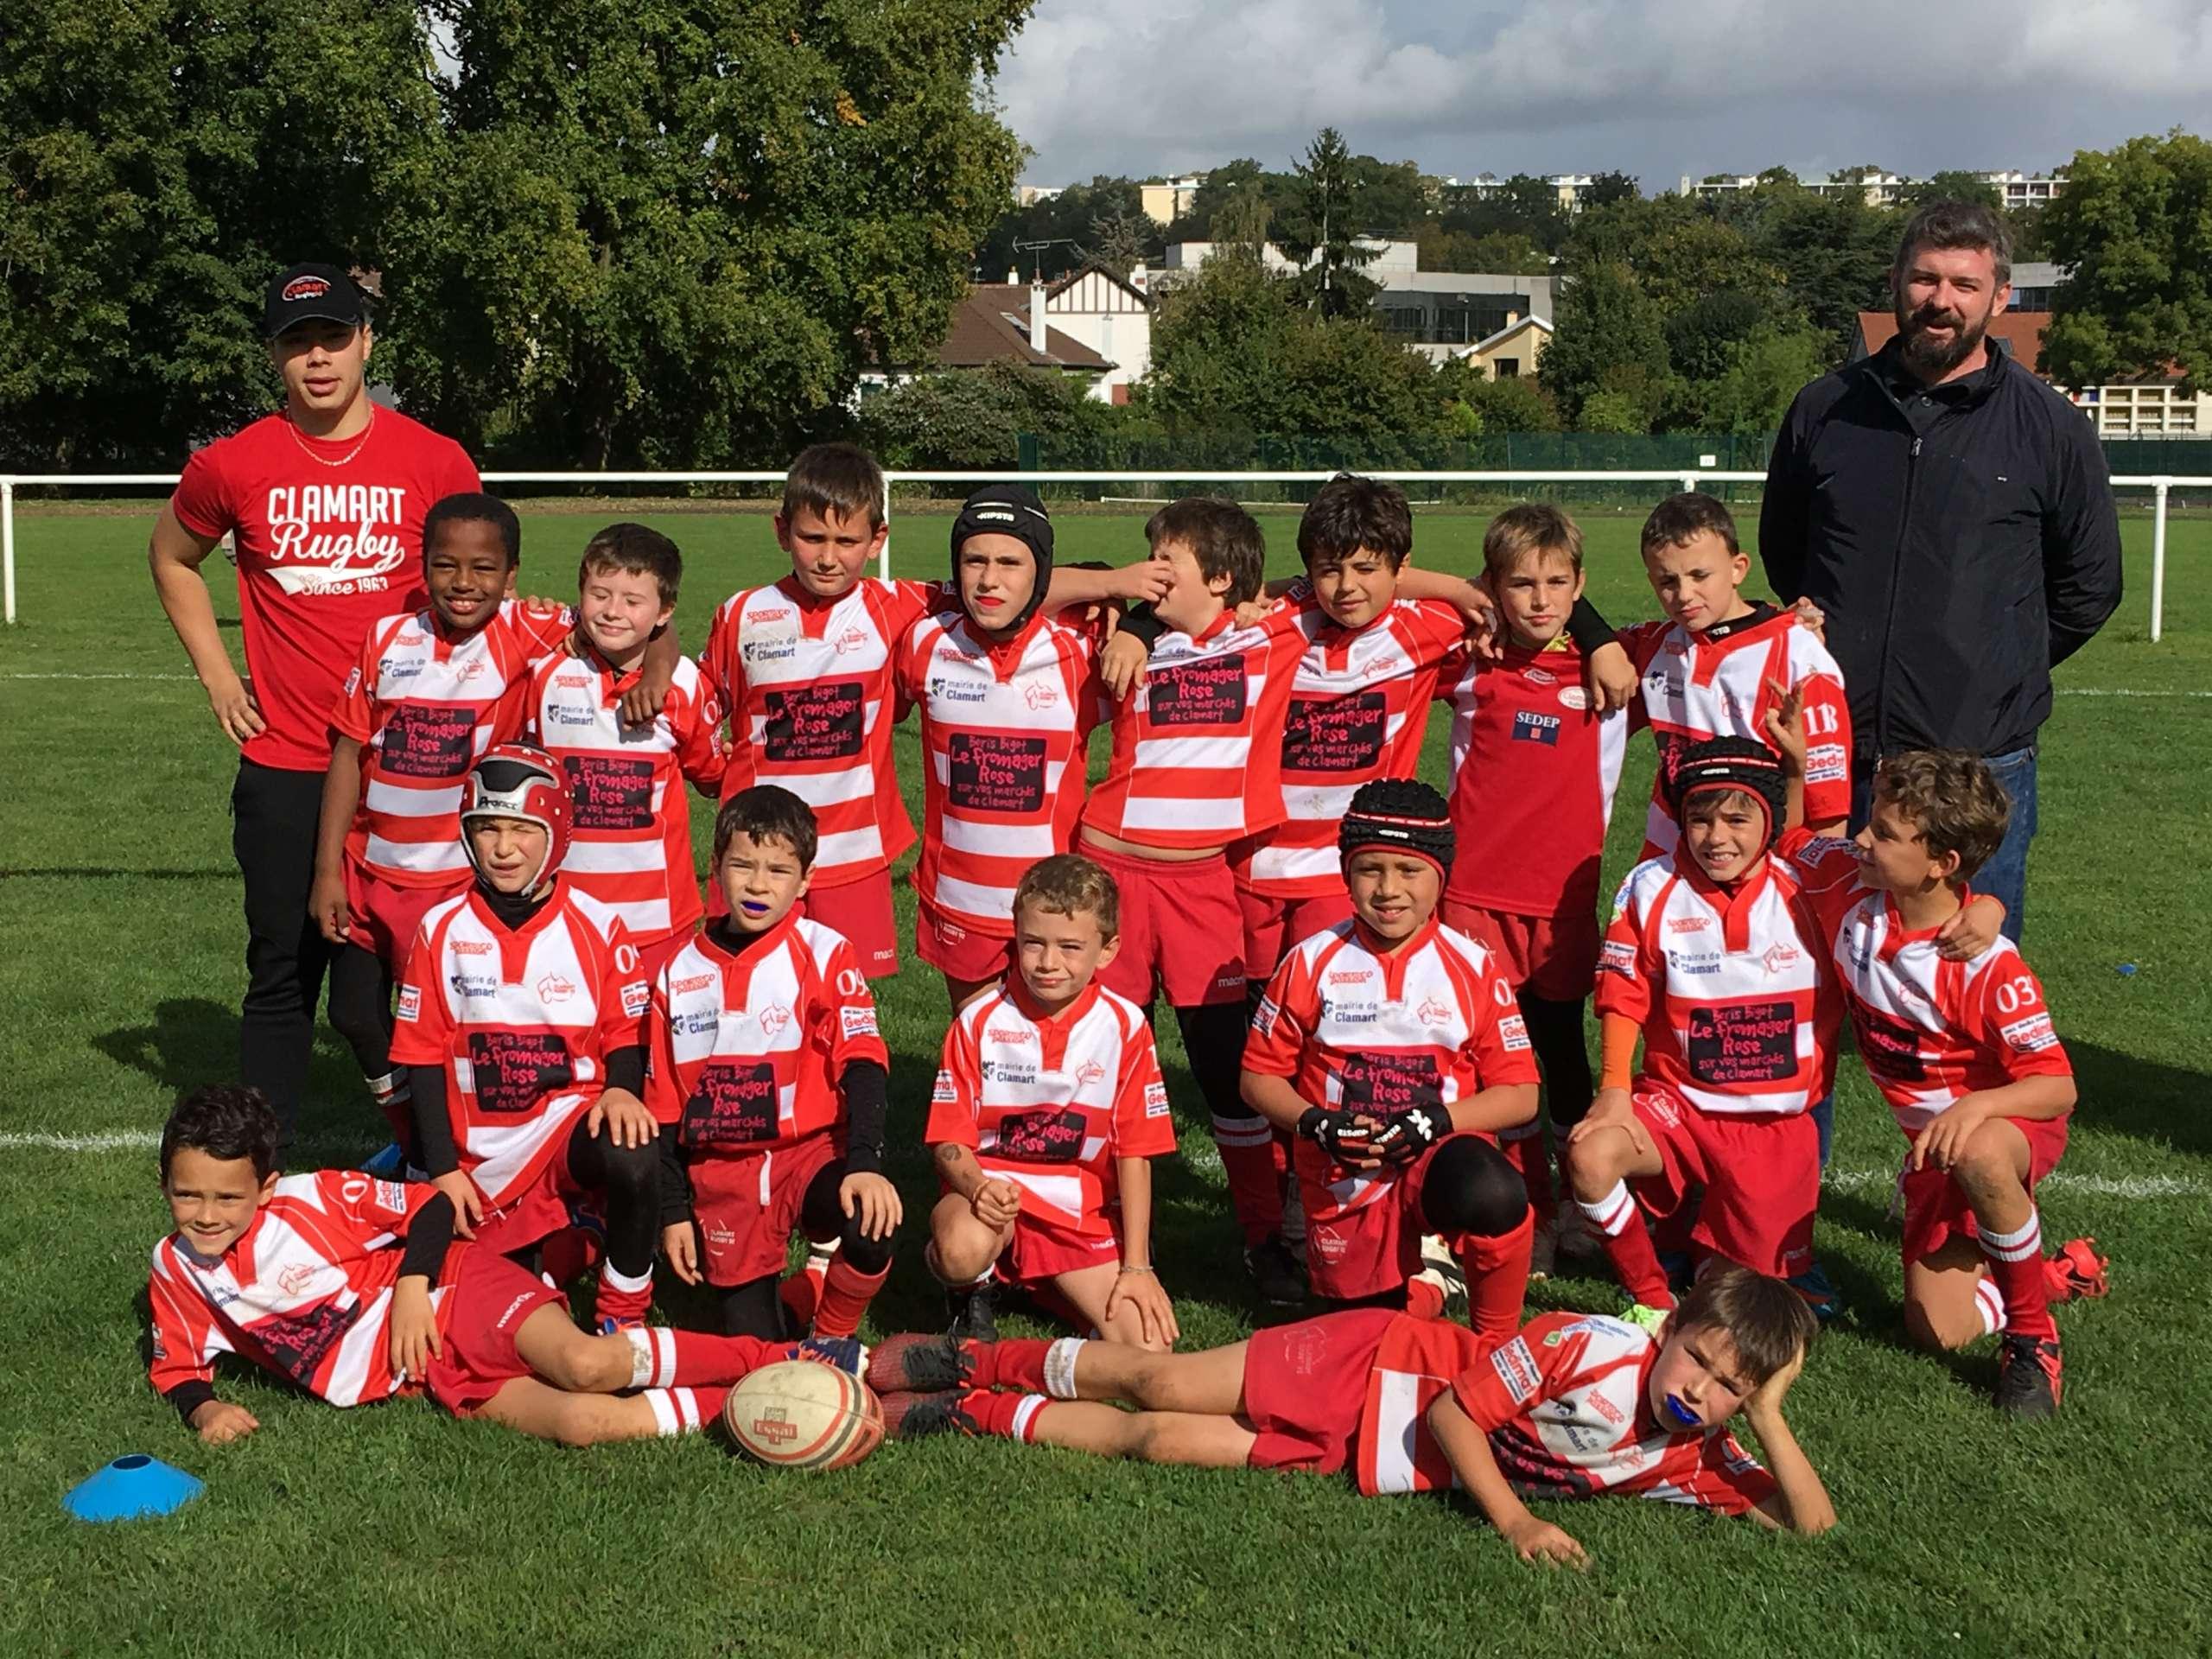 Clamart Rugby 92 Triangulaire U10 de Marne La Coquette 30 septembre 2017